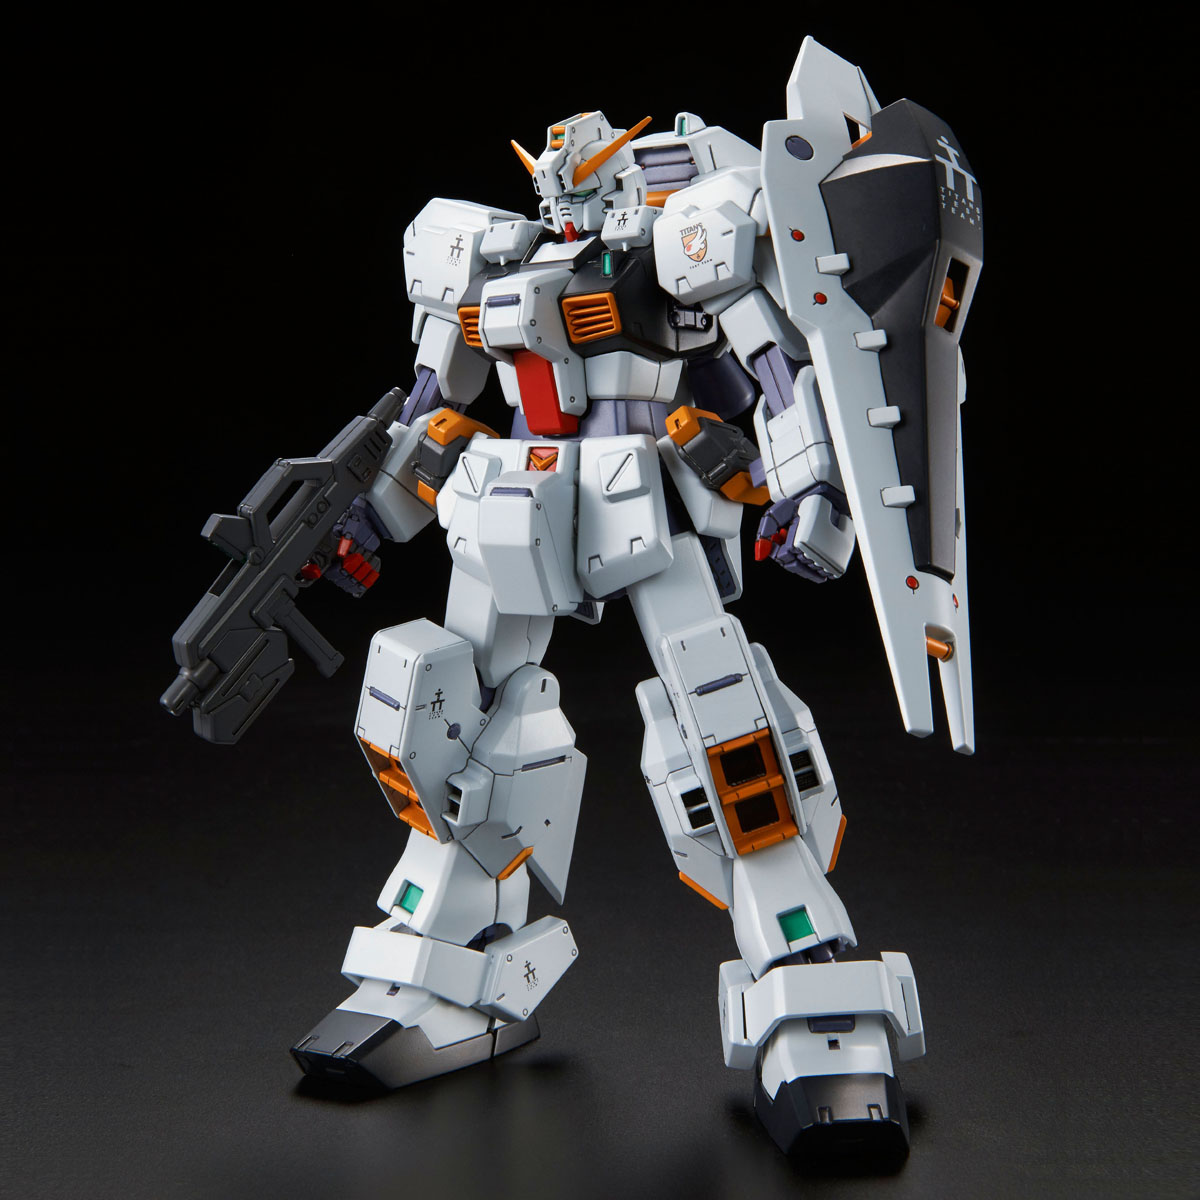 MG 1/100 RX-121-1 ガンダムTR-1[ヘイズル改] [Gundam TR-1 [Hazel Custom]]